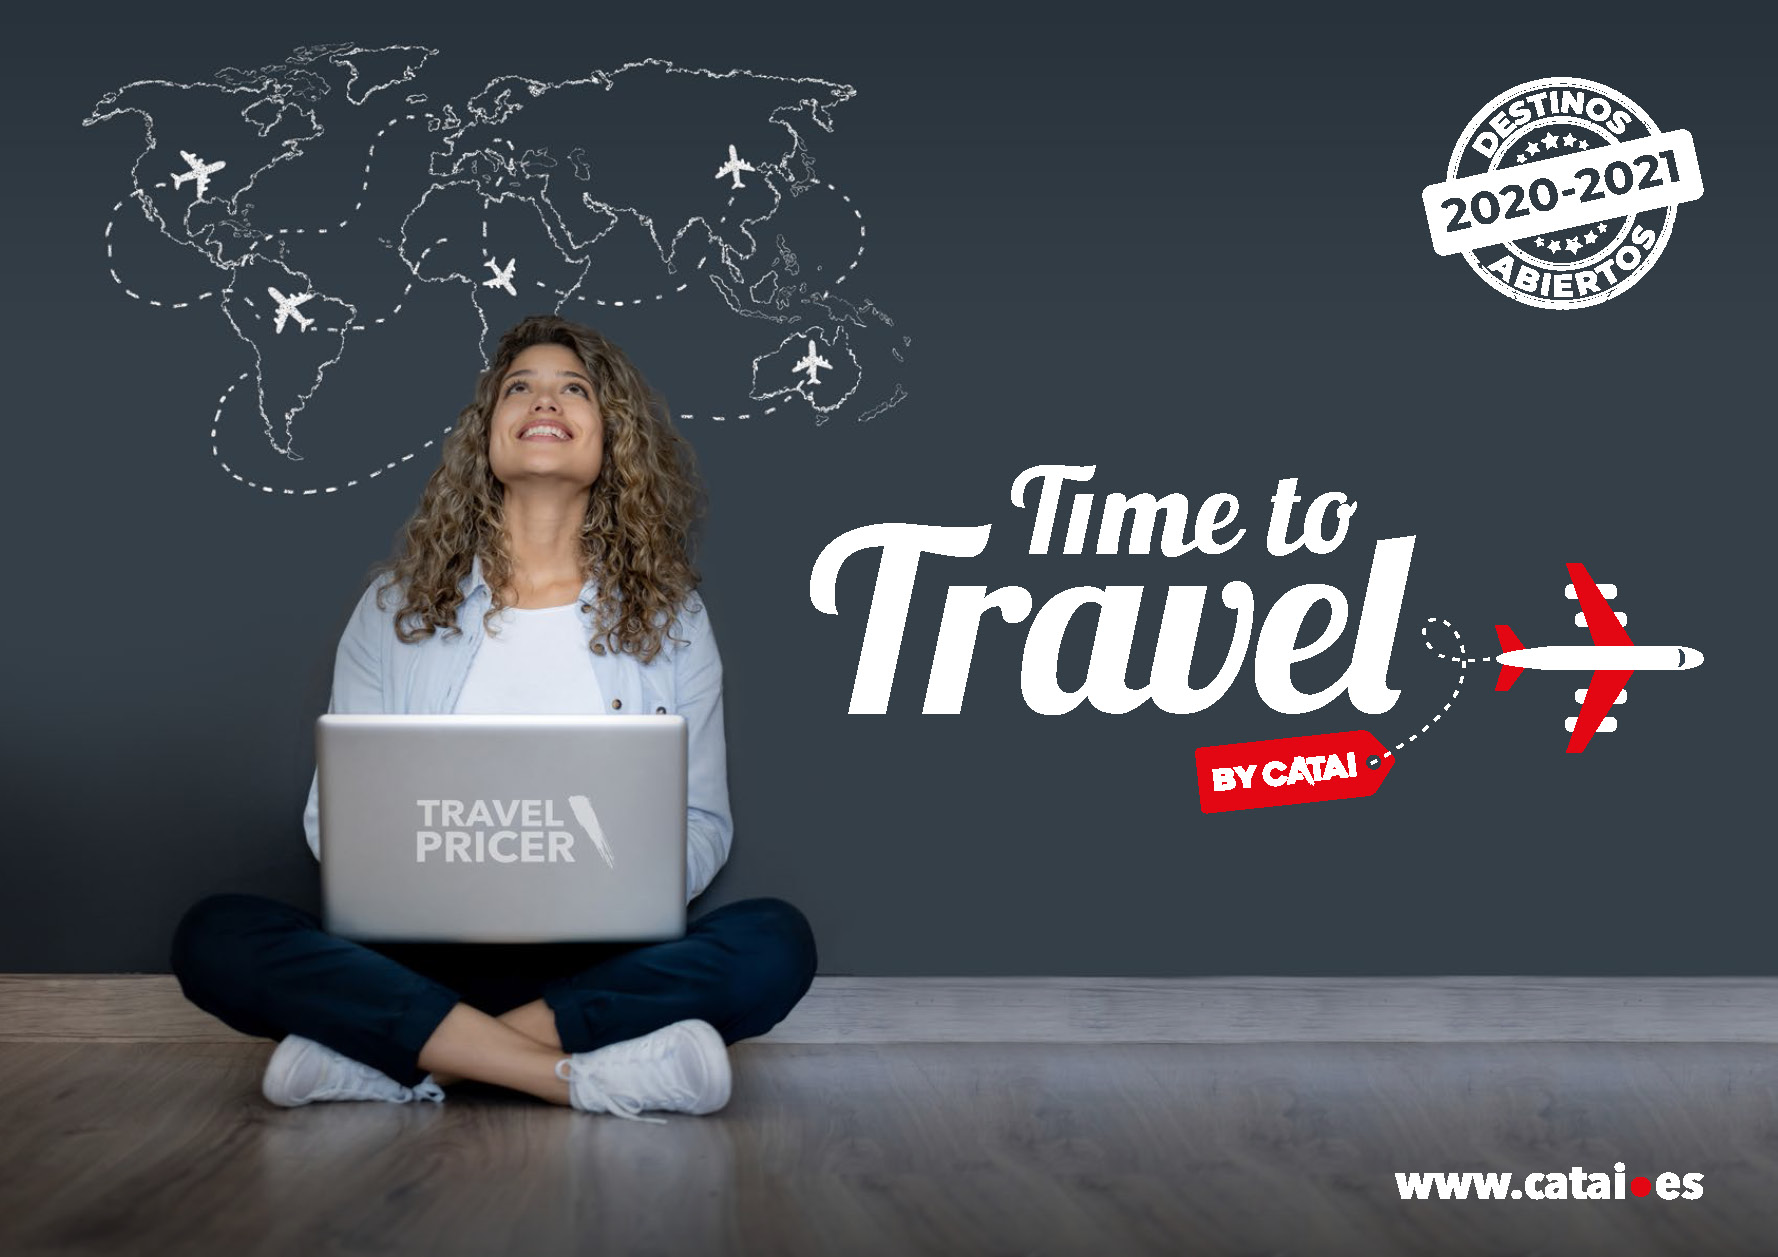 Catai Guia de Destinos Abiertos TimeToTravel 2020-2021